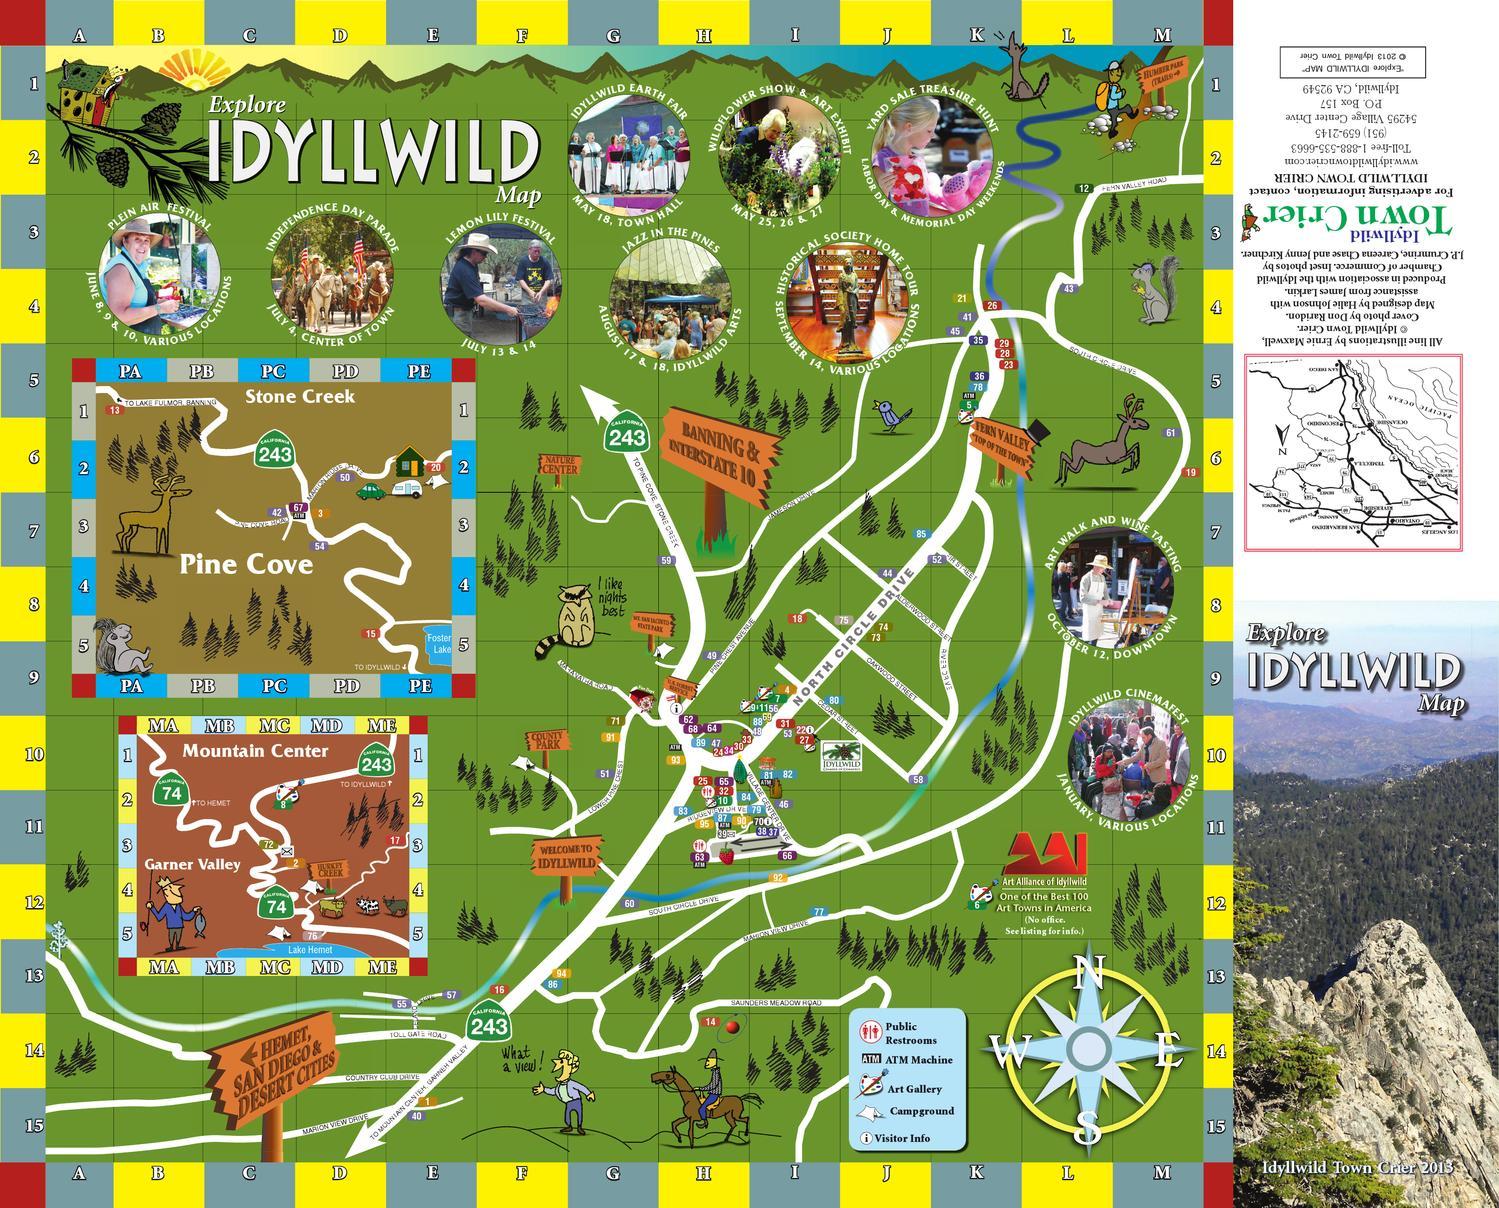 Explore Idyllwild Map 2013 By Idyllwild Town Crier Issuu